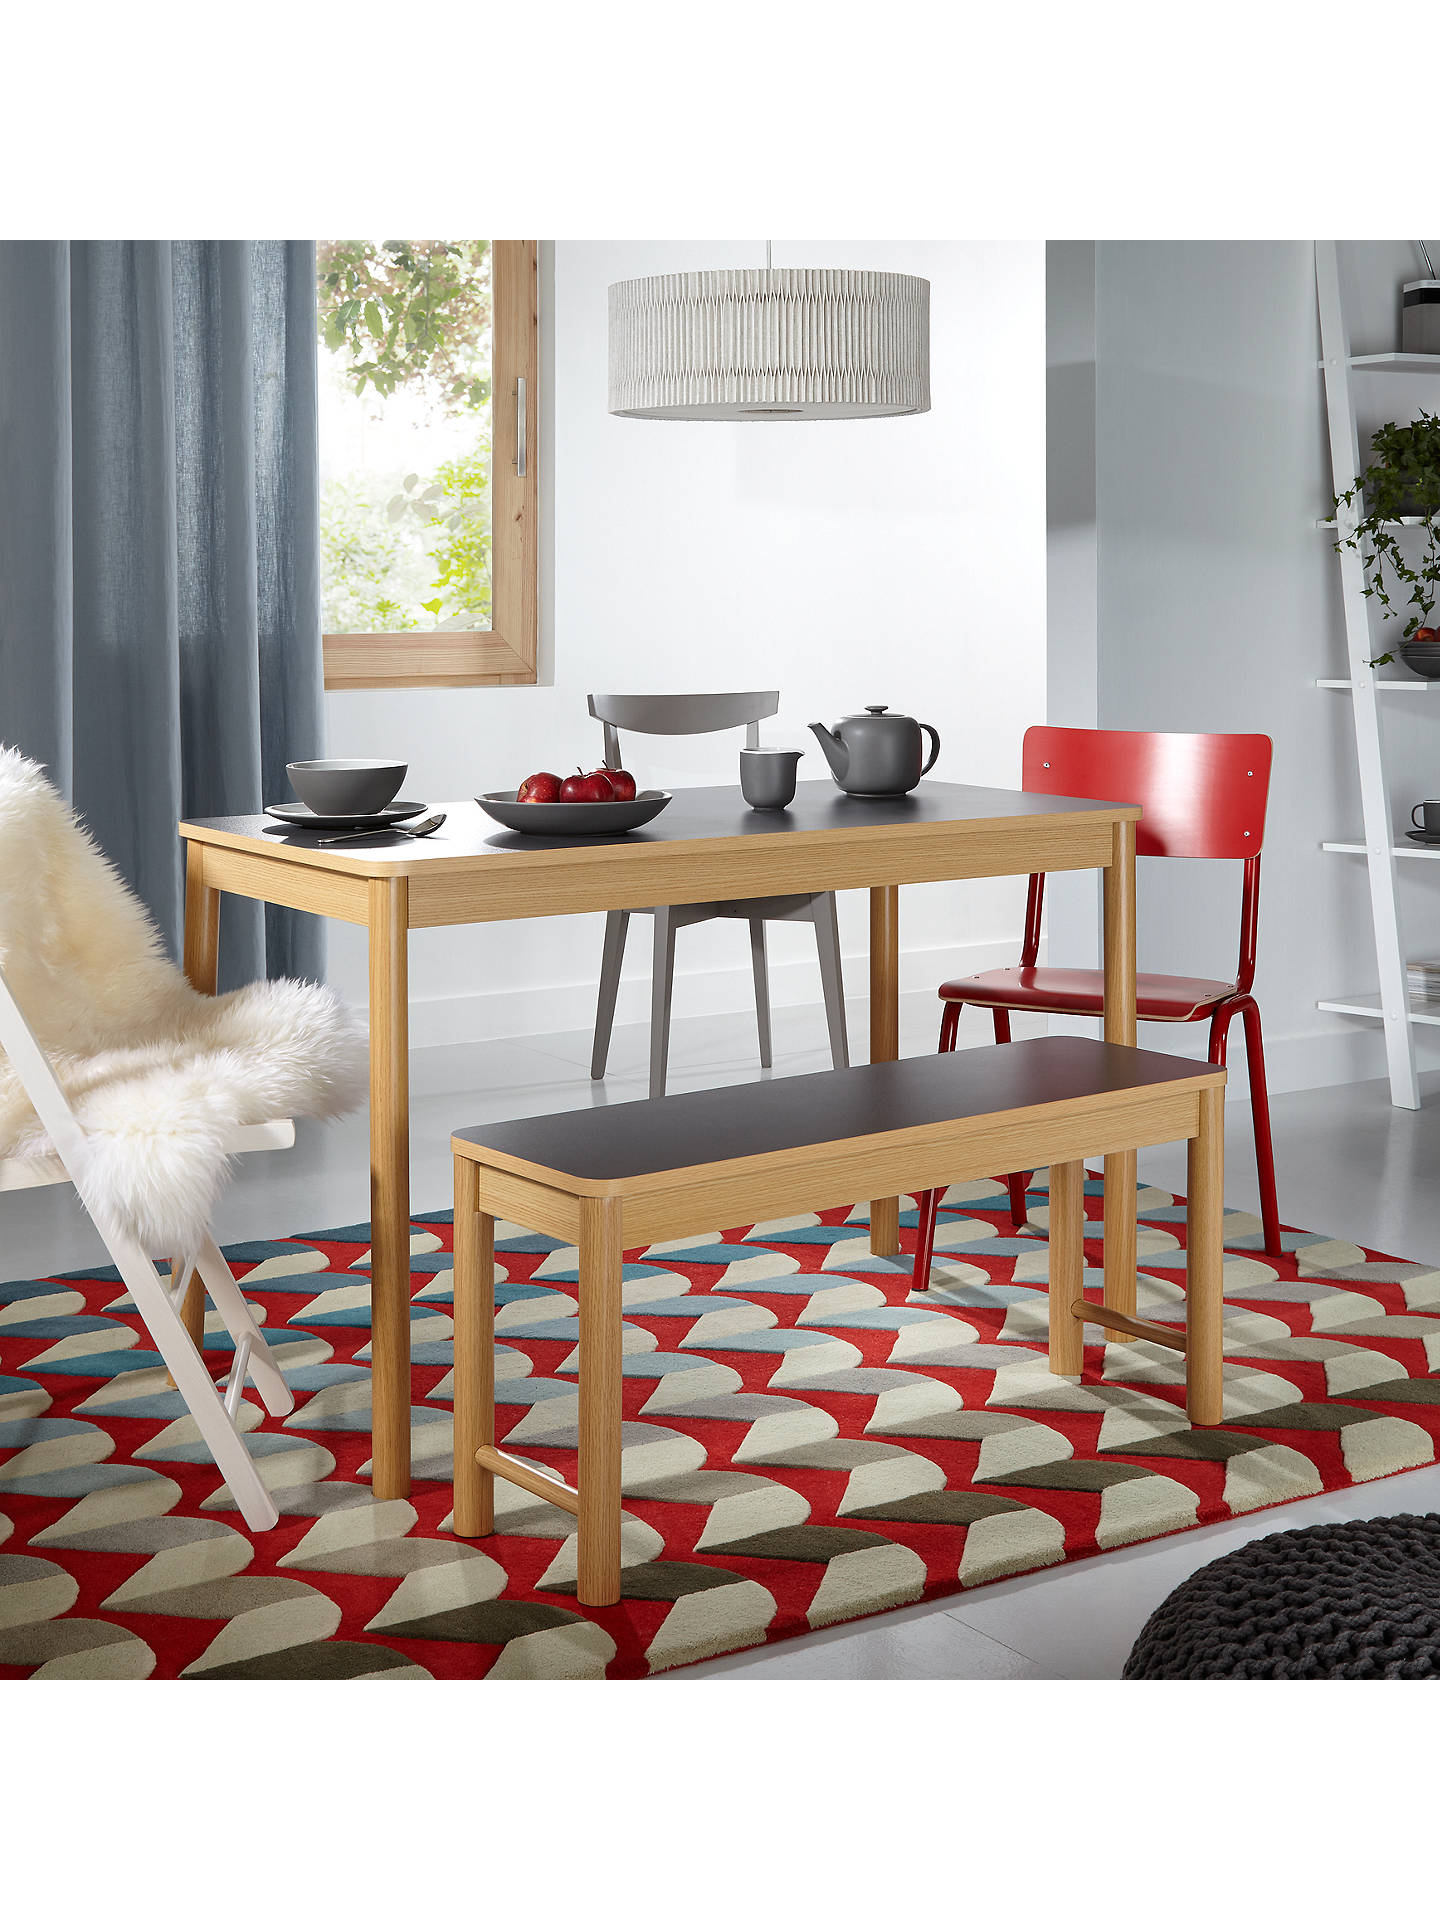 Pleasing John Lewis Peyton 3 Seater Dining Bench Theyellowbook Wood Chair Design Ideas Theyellowbookinfo